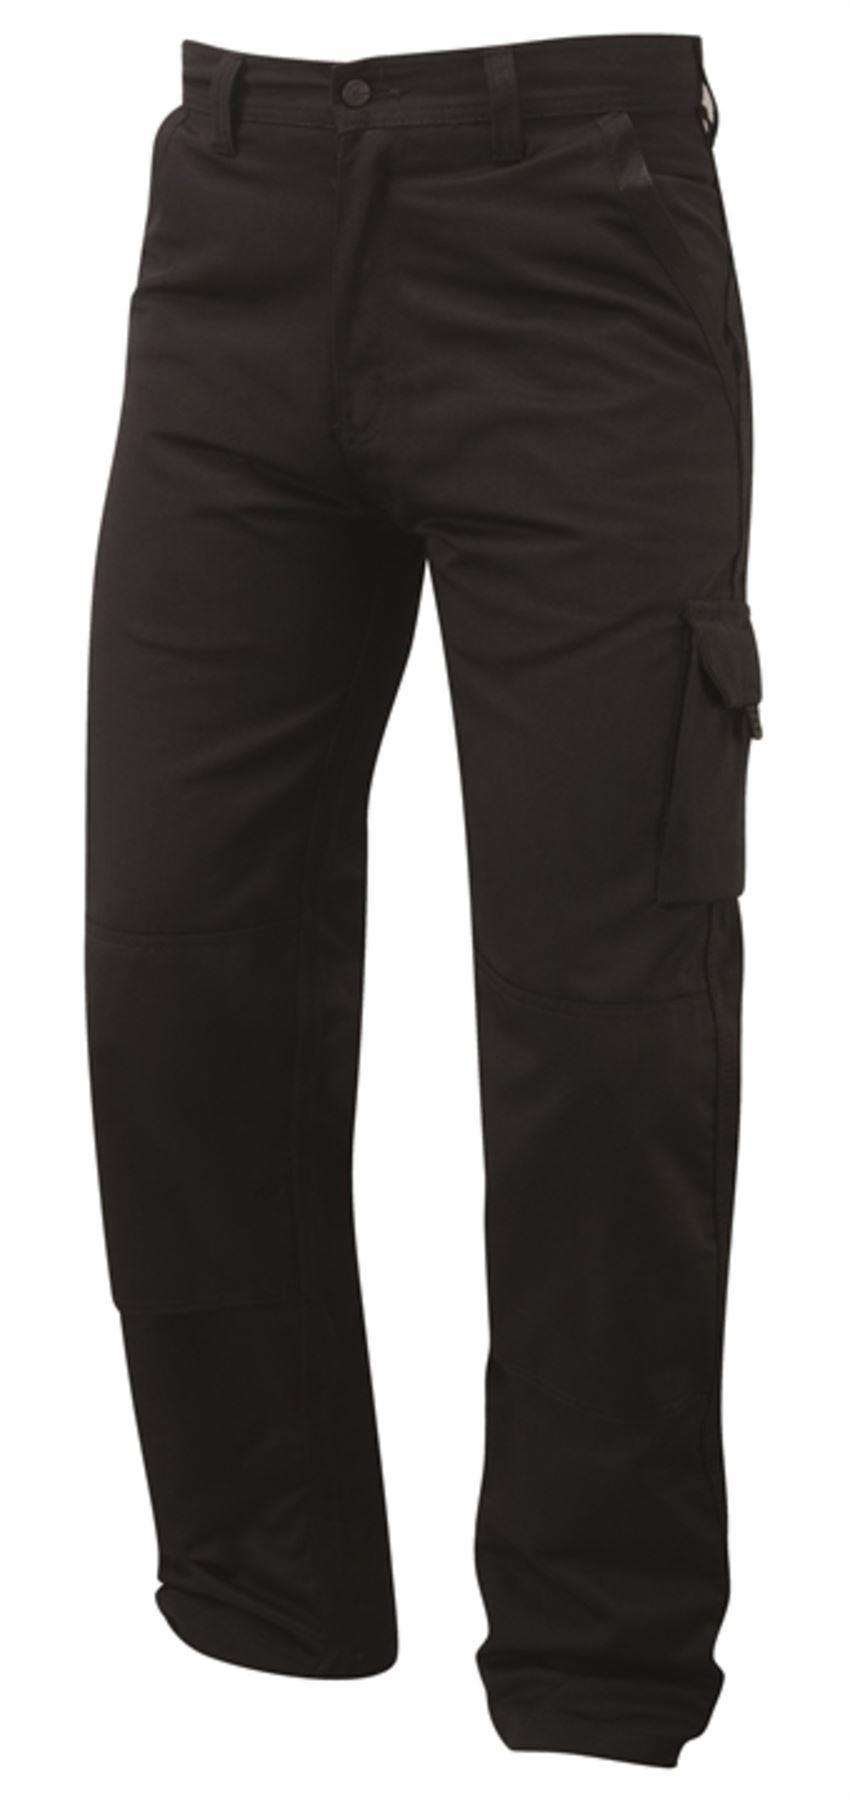 Orn Heron Kneepad Combat Trousers - Black|50W29L